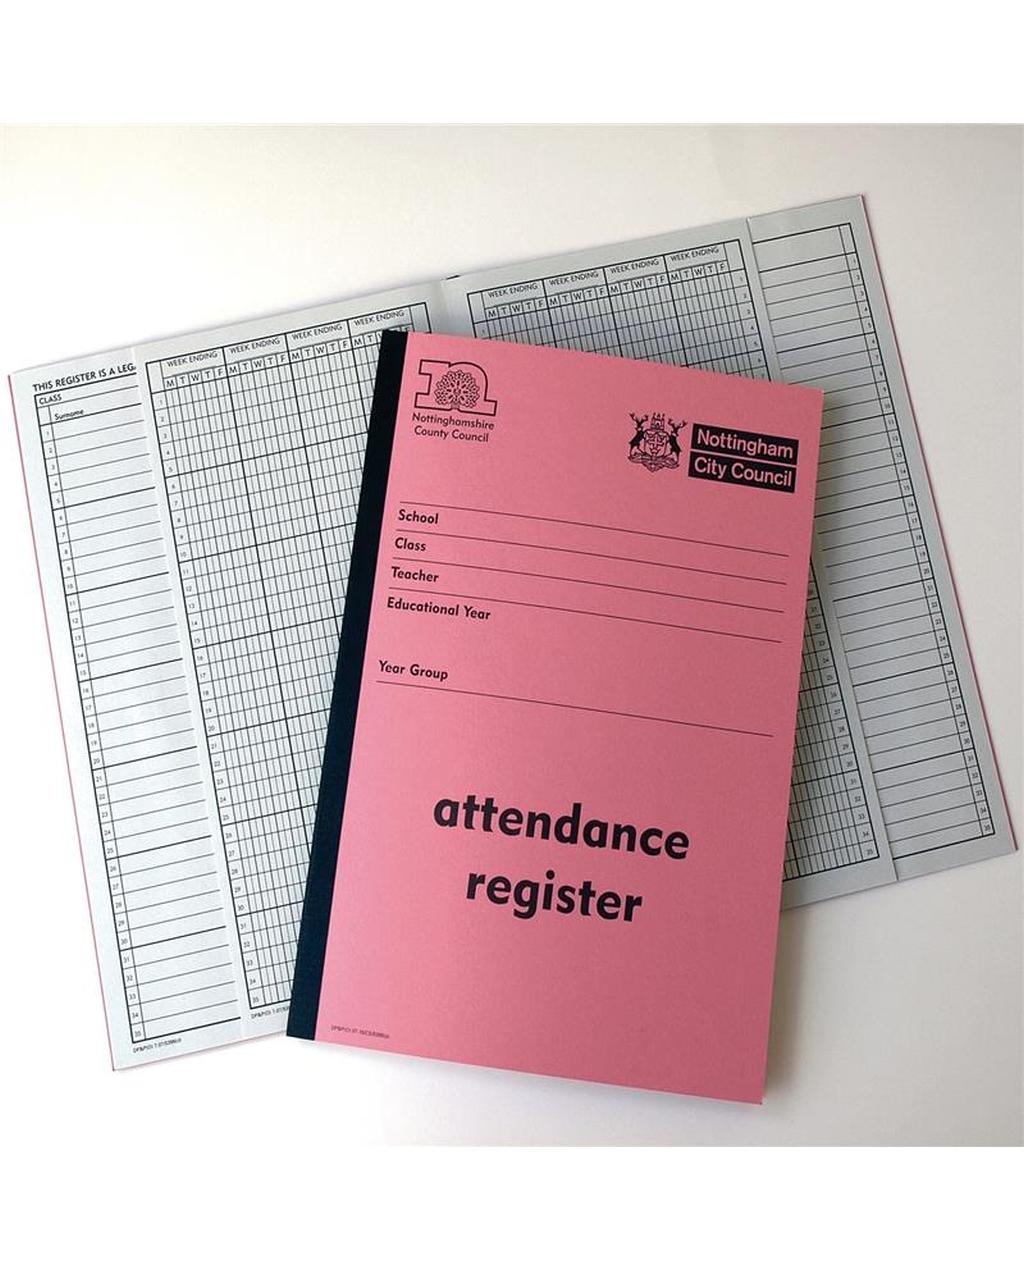 Class Attendance Register for Nottinghamshire Schools